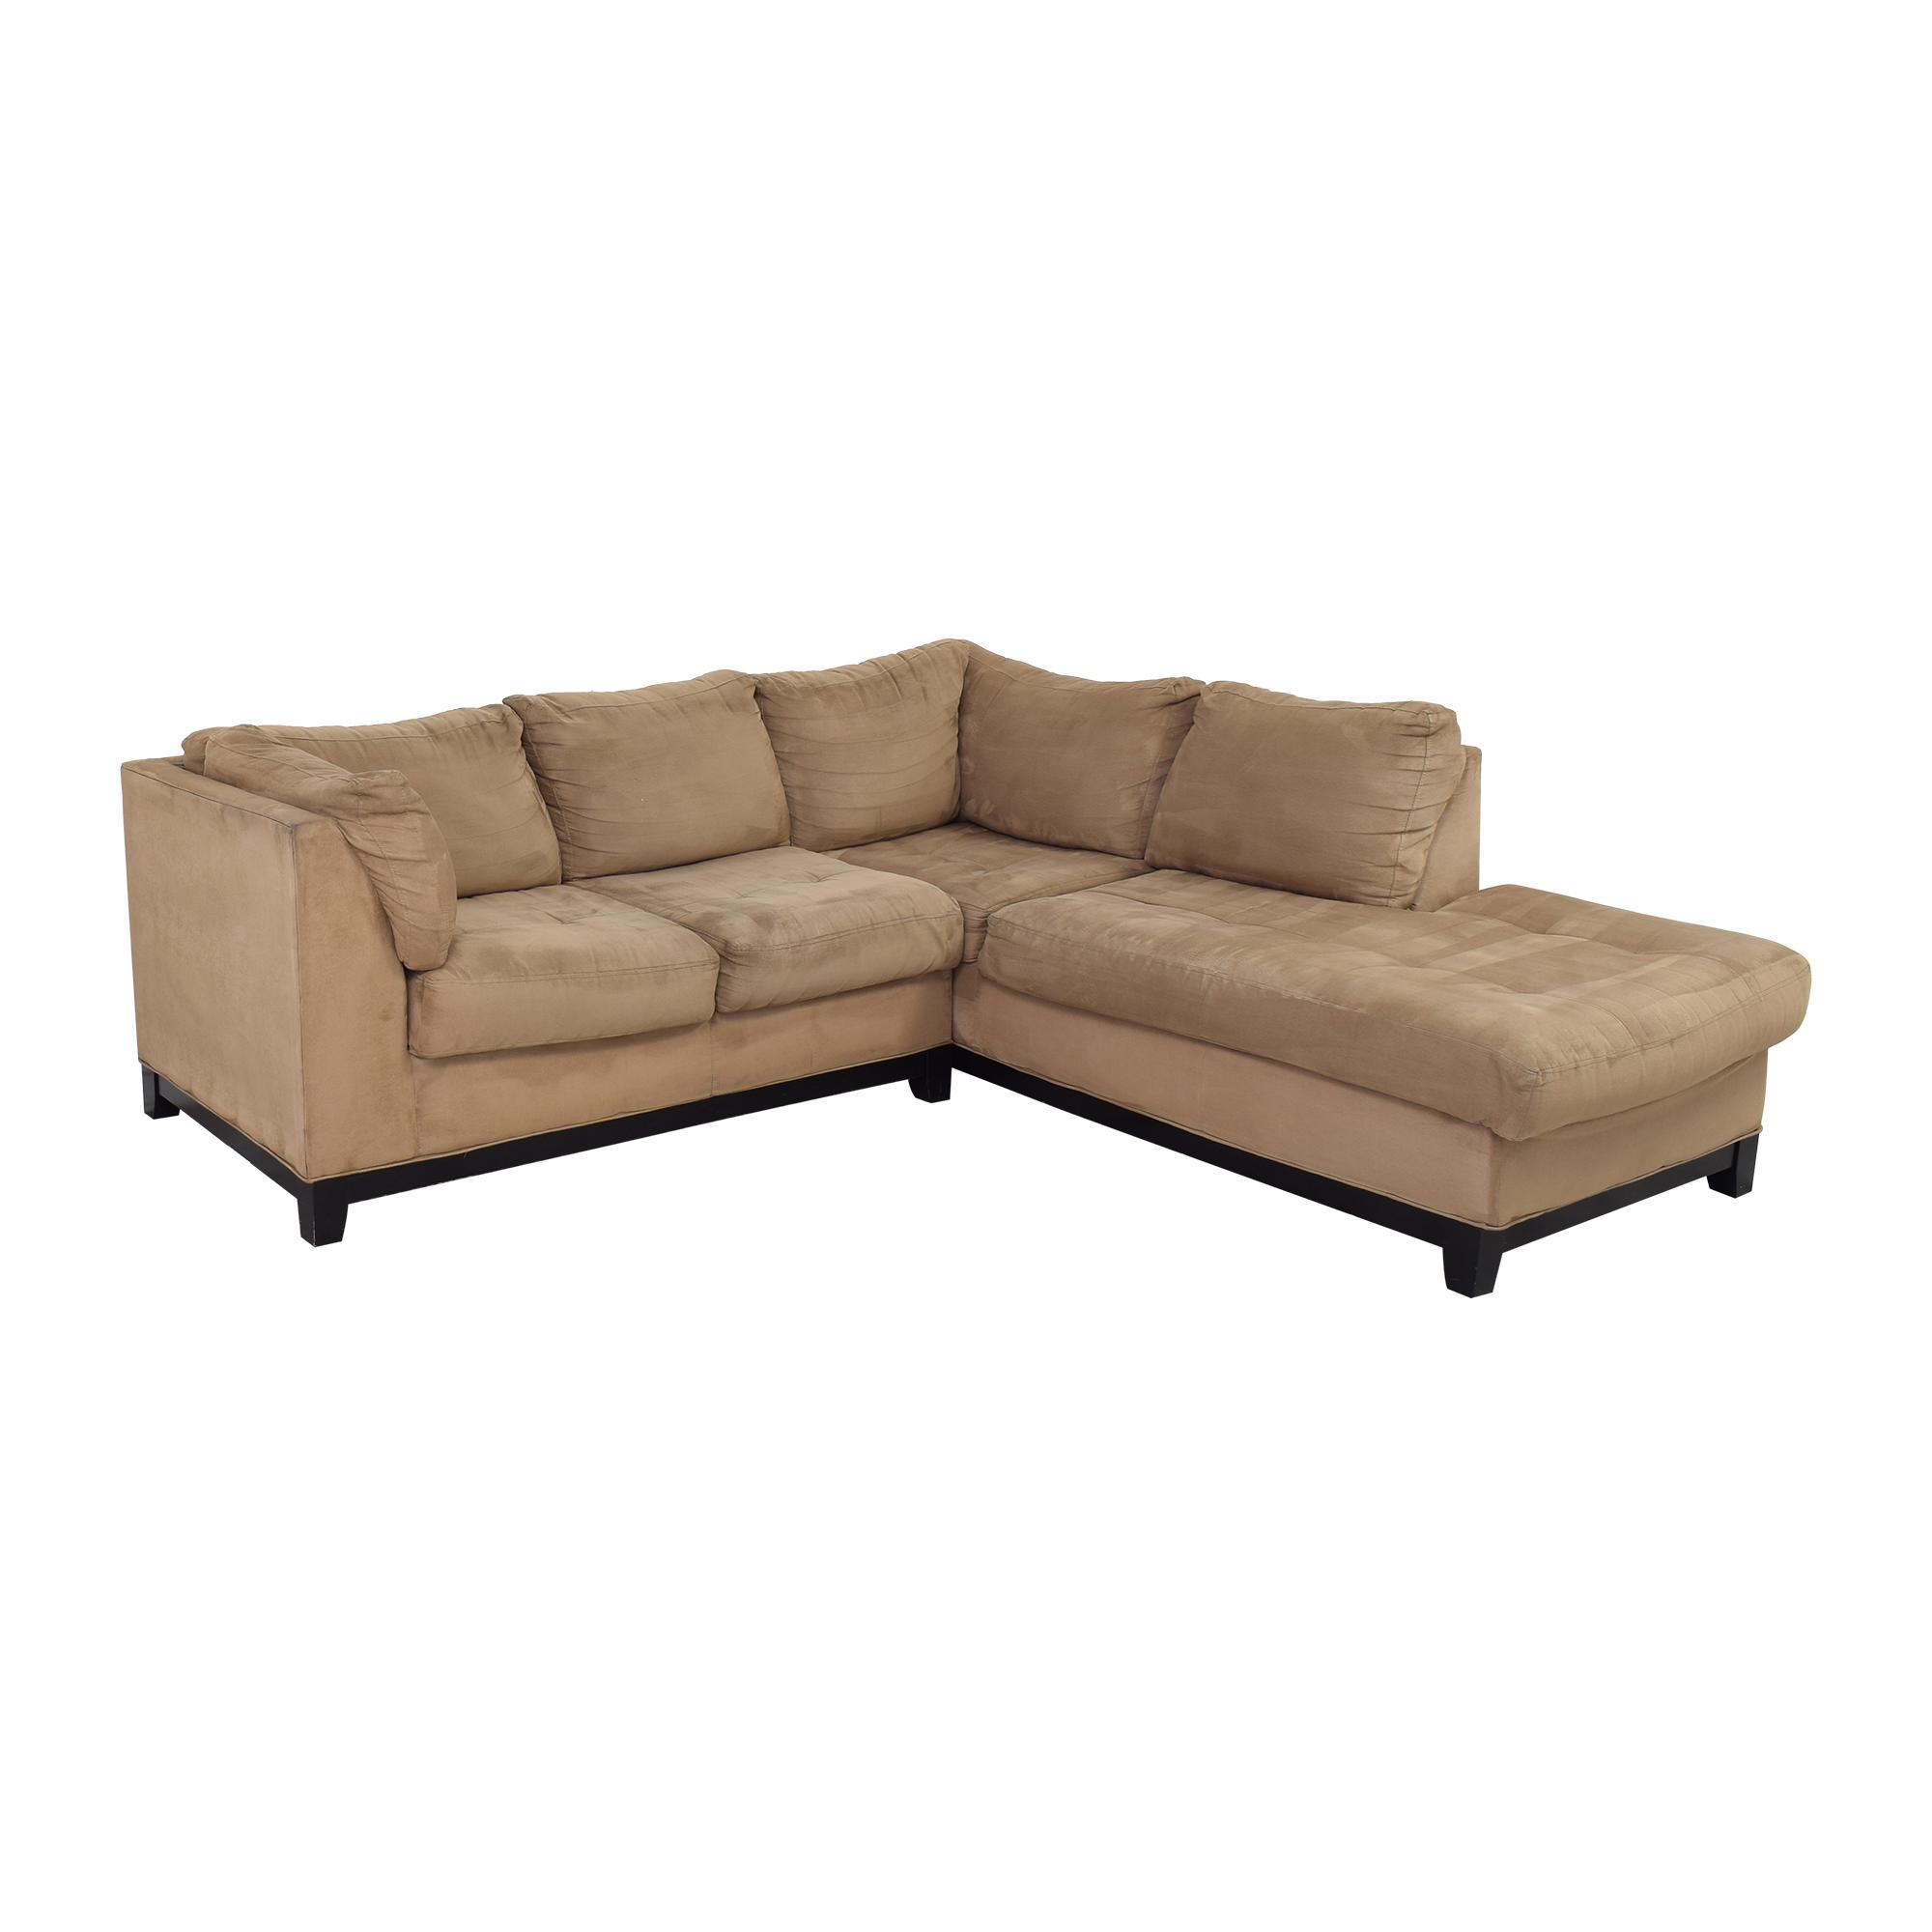 Raymour & Flanigan Raymour & Flanigan Kathy Ireland Chaise Sectional Sofa